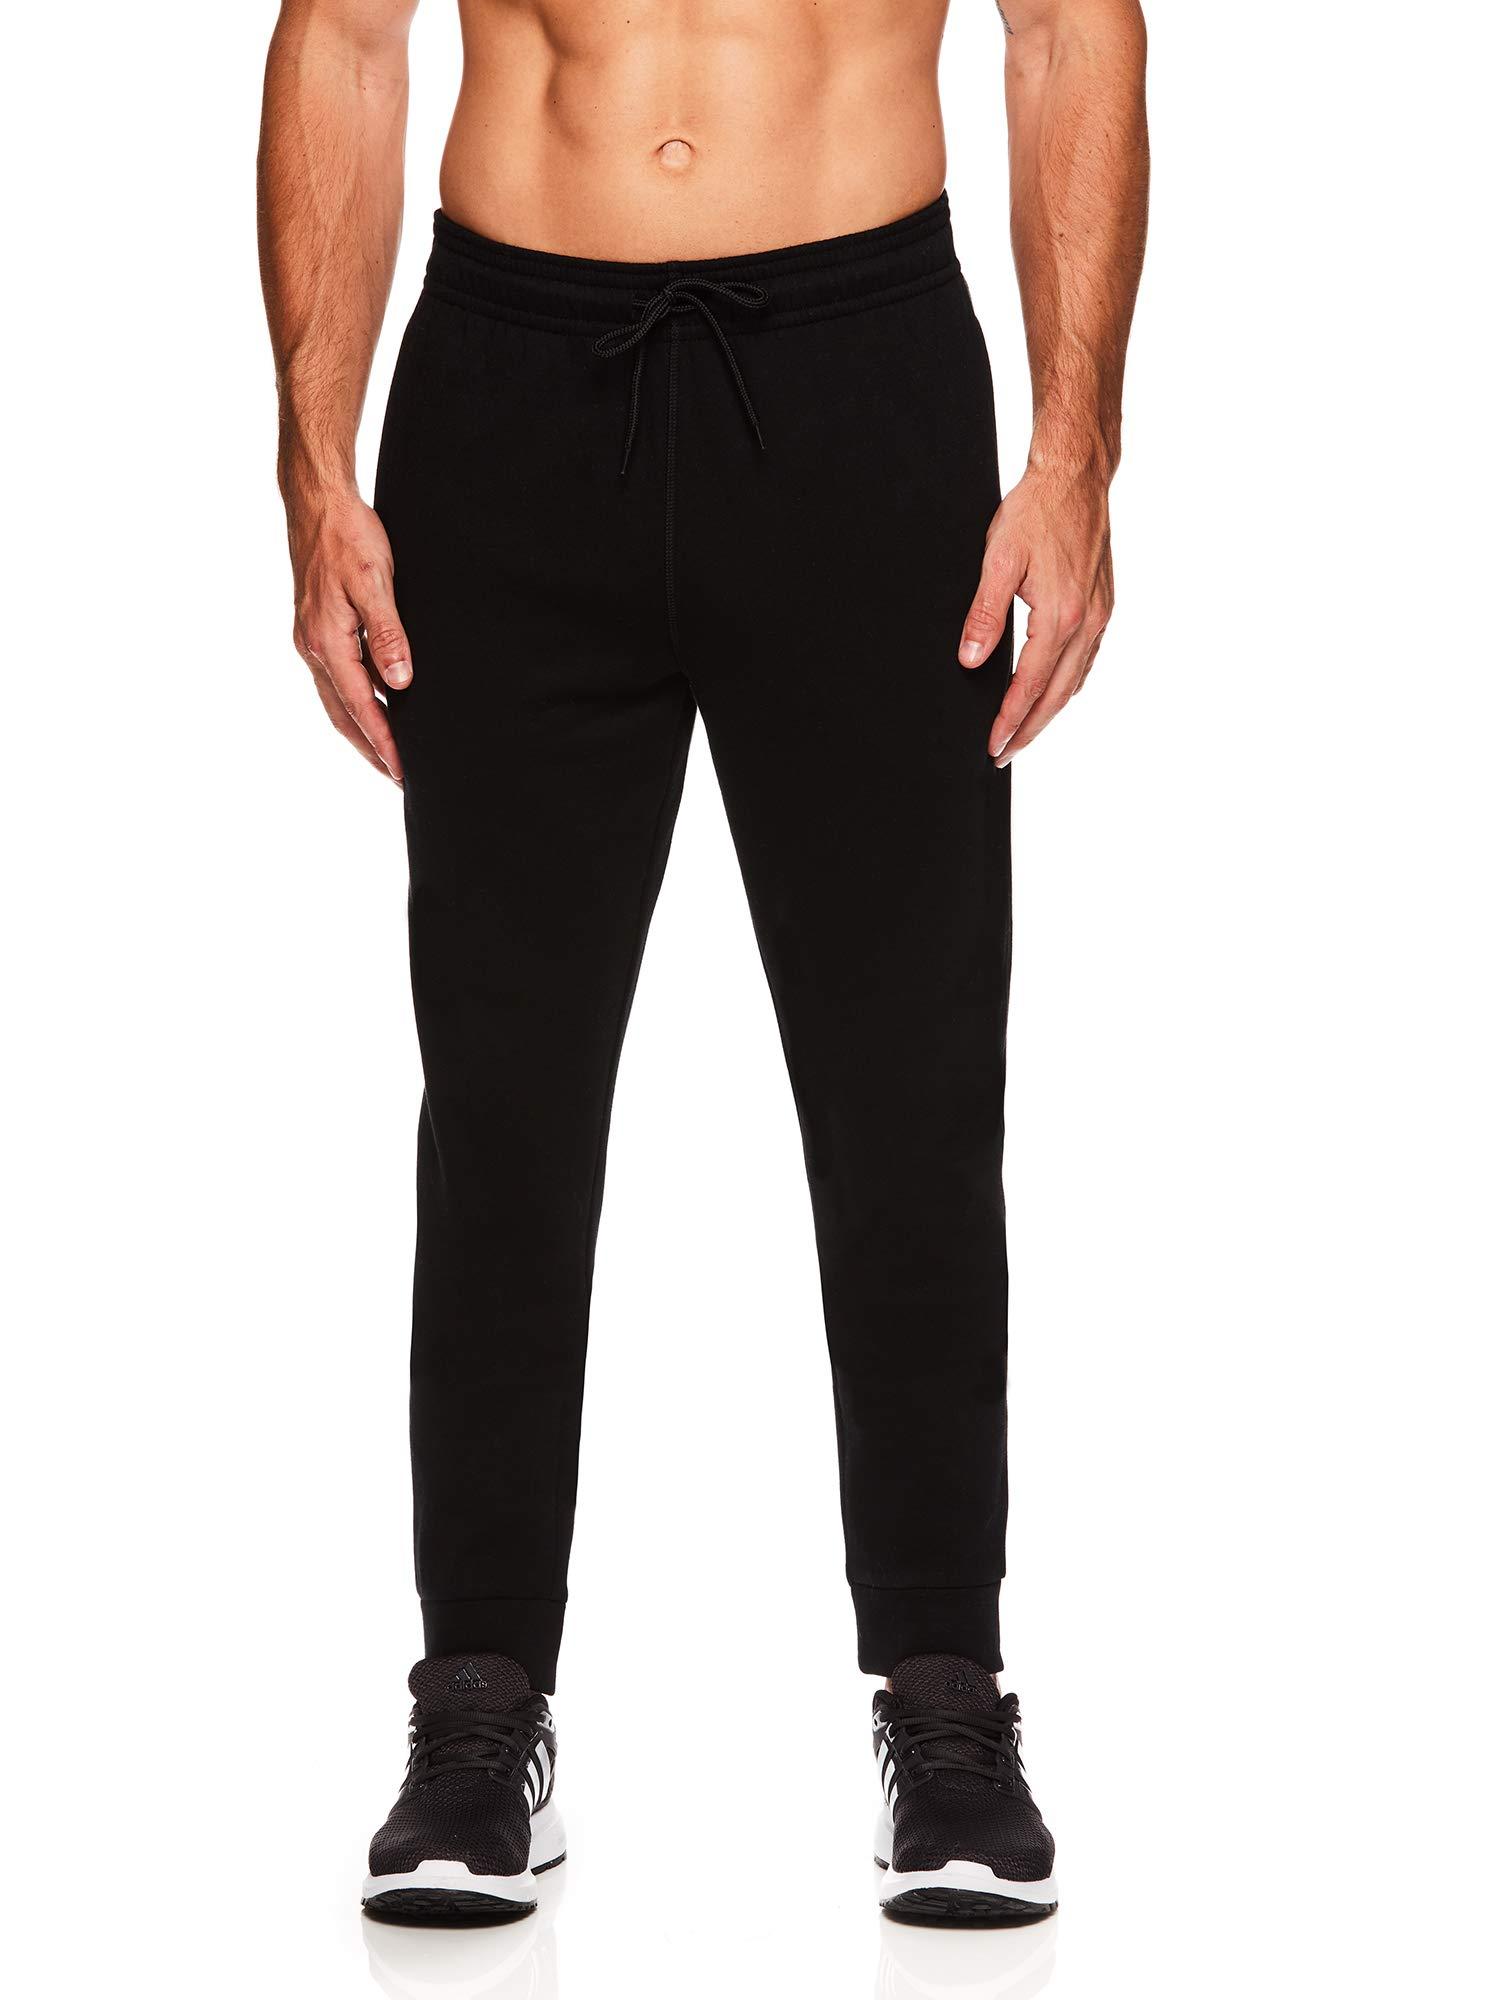 HEAD Men's Jogger Activewear Pants - Performance Workout & Running Sweatpants - Ultra Black, Small